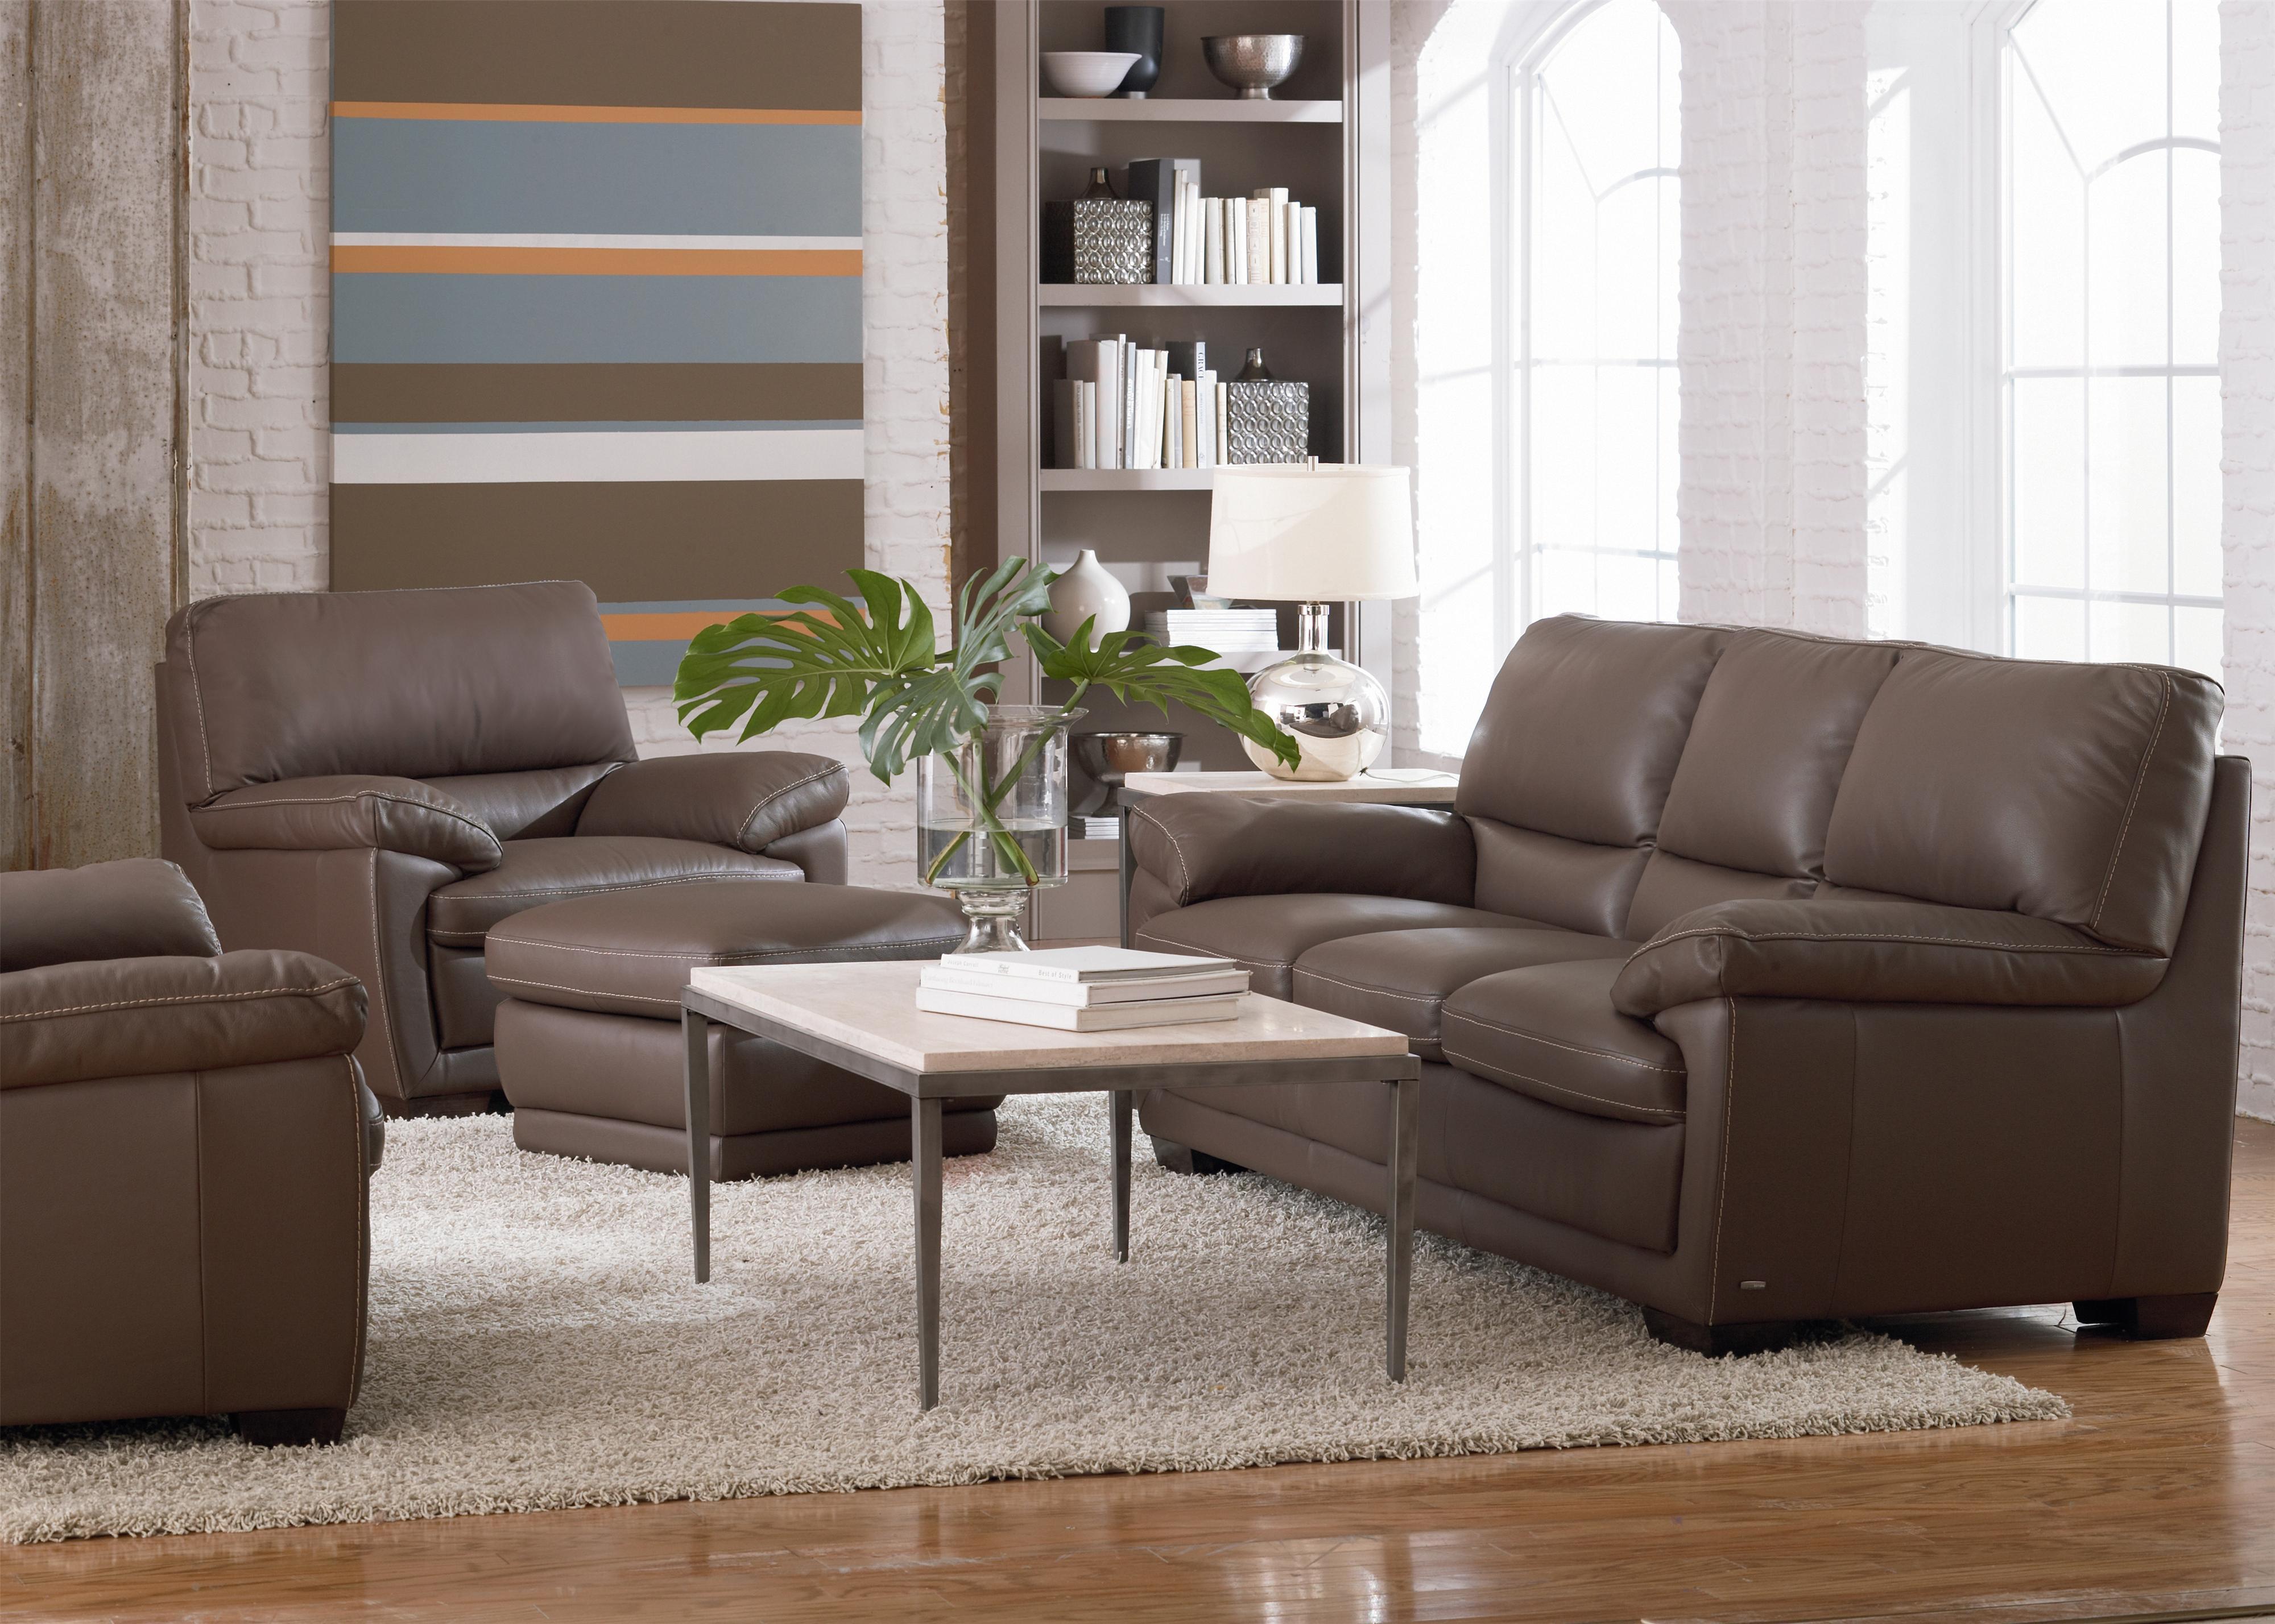 Natuzzi Editions B674 Stationary Living Room Group